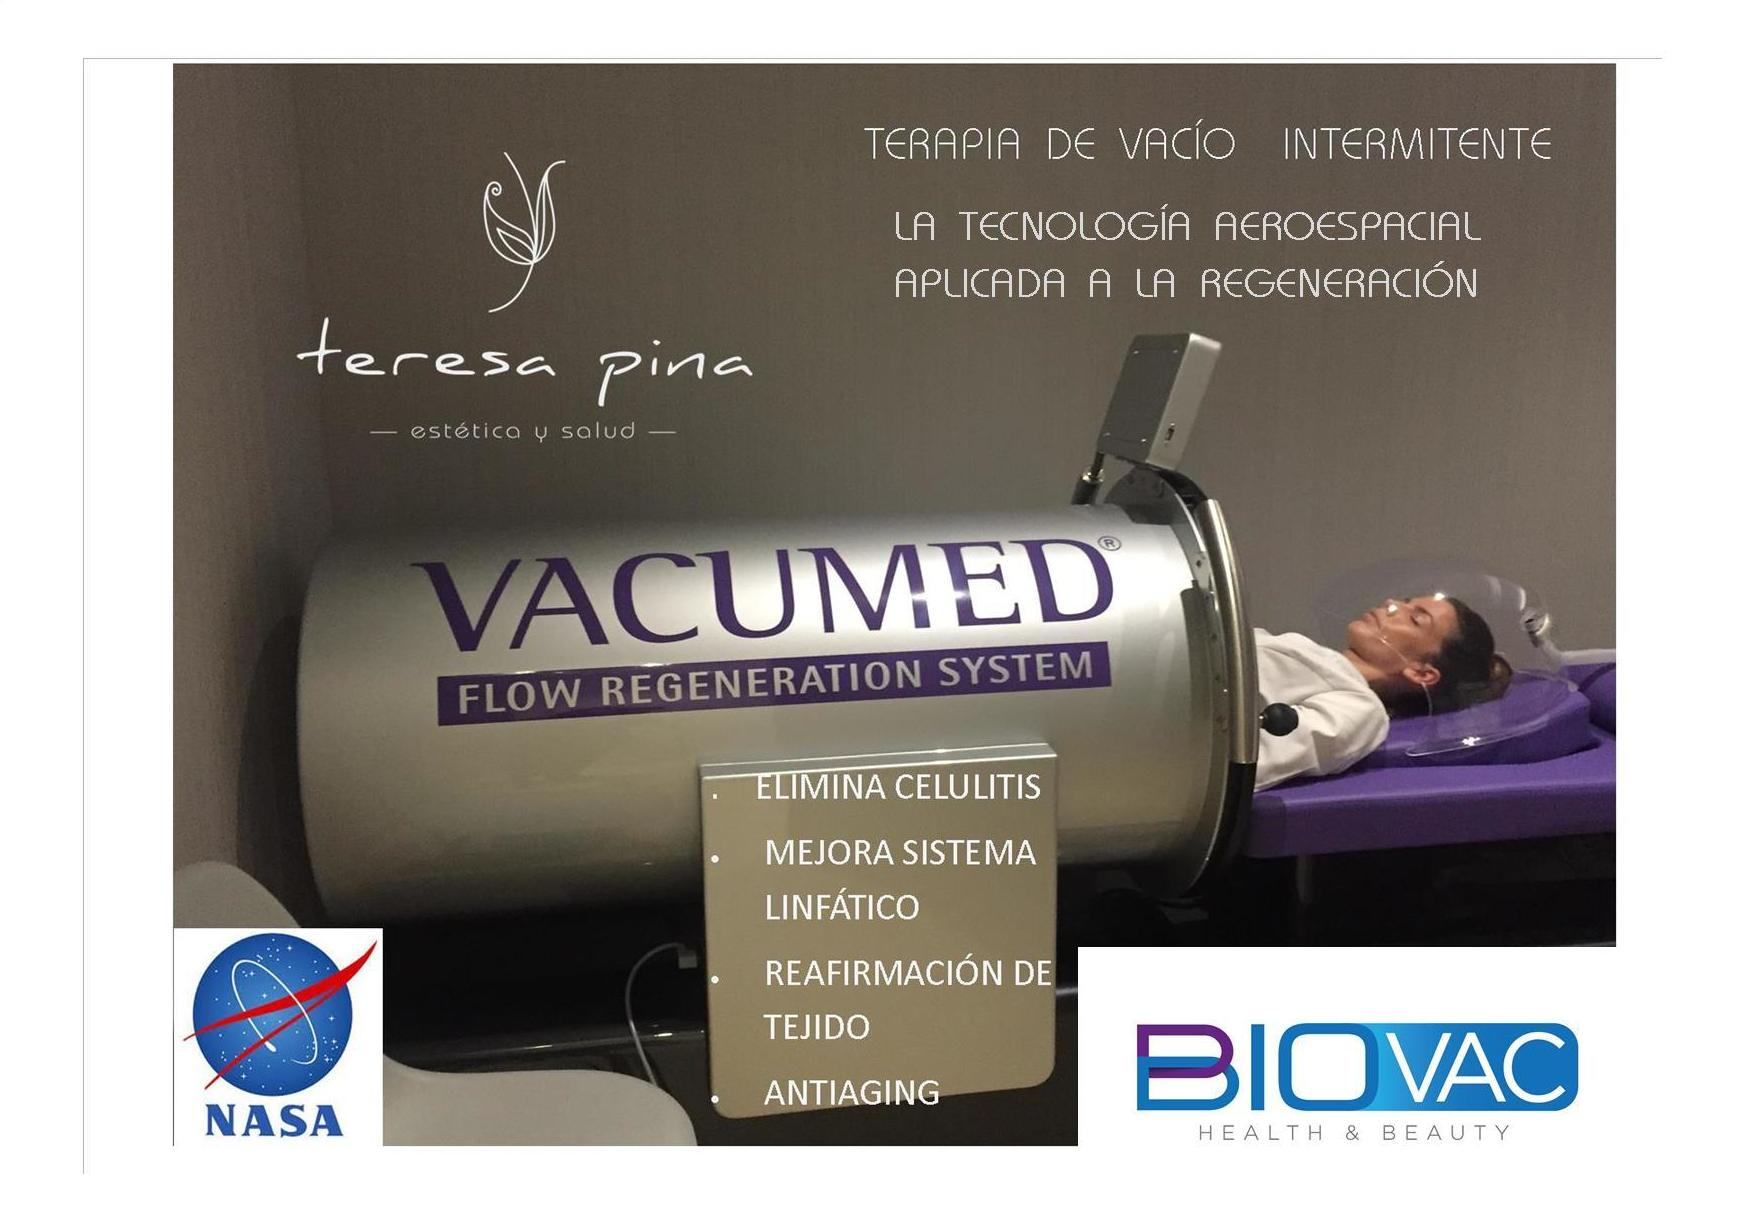 VACUMED: Servicios de Centro Teresa Pina